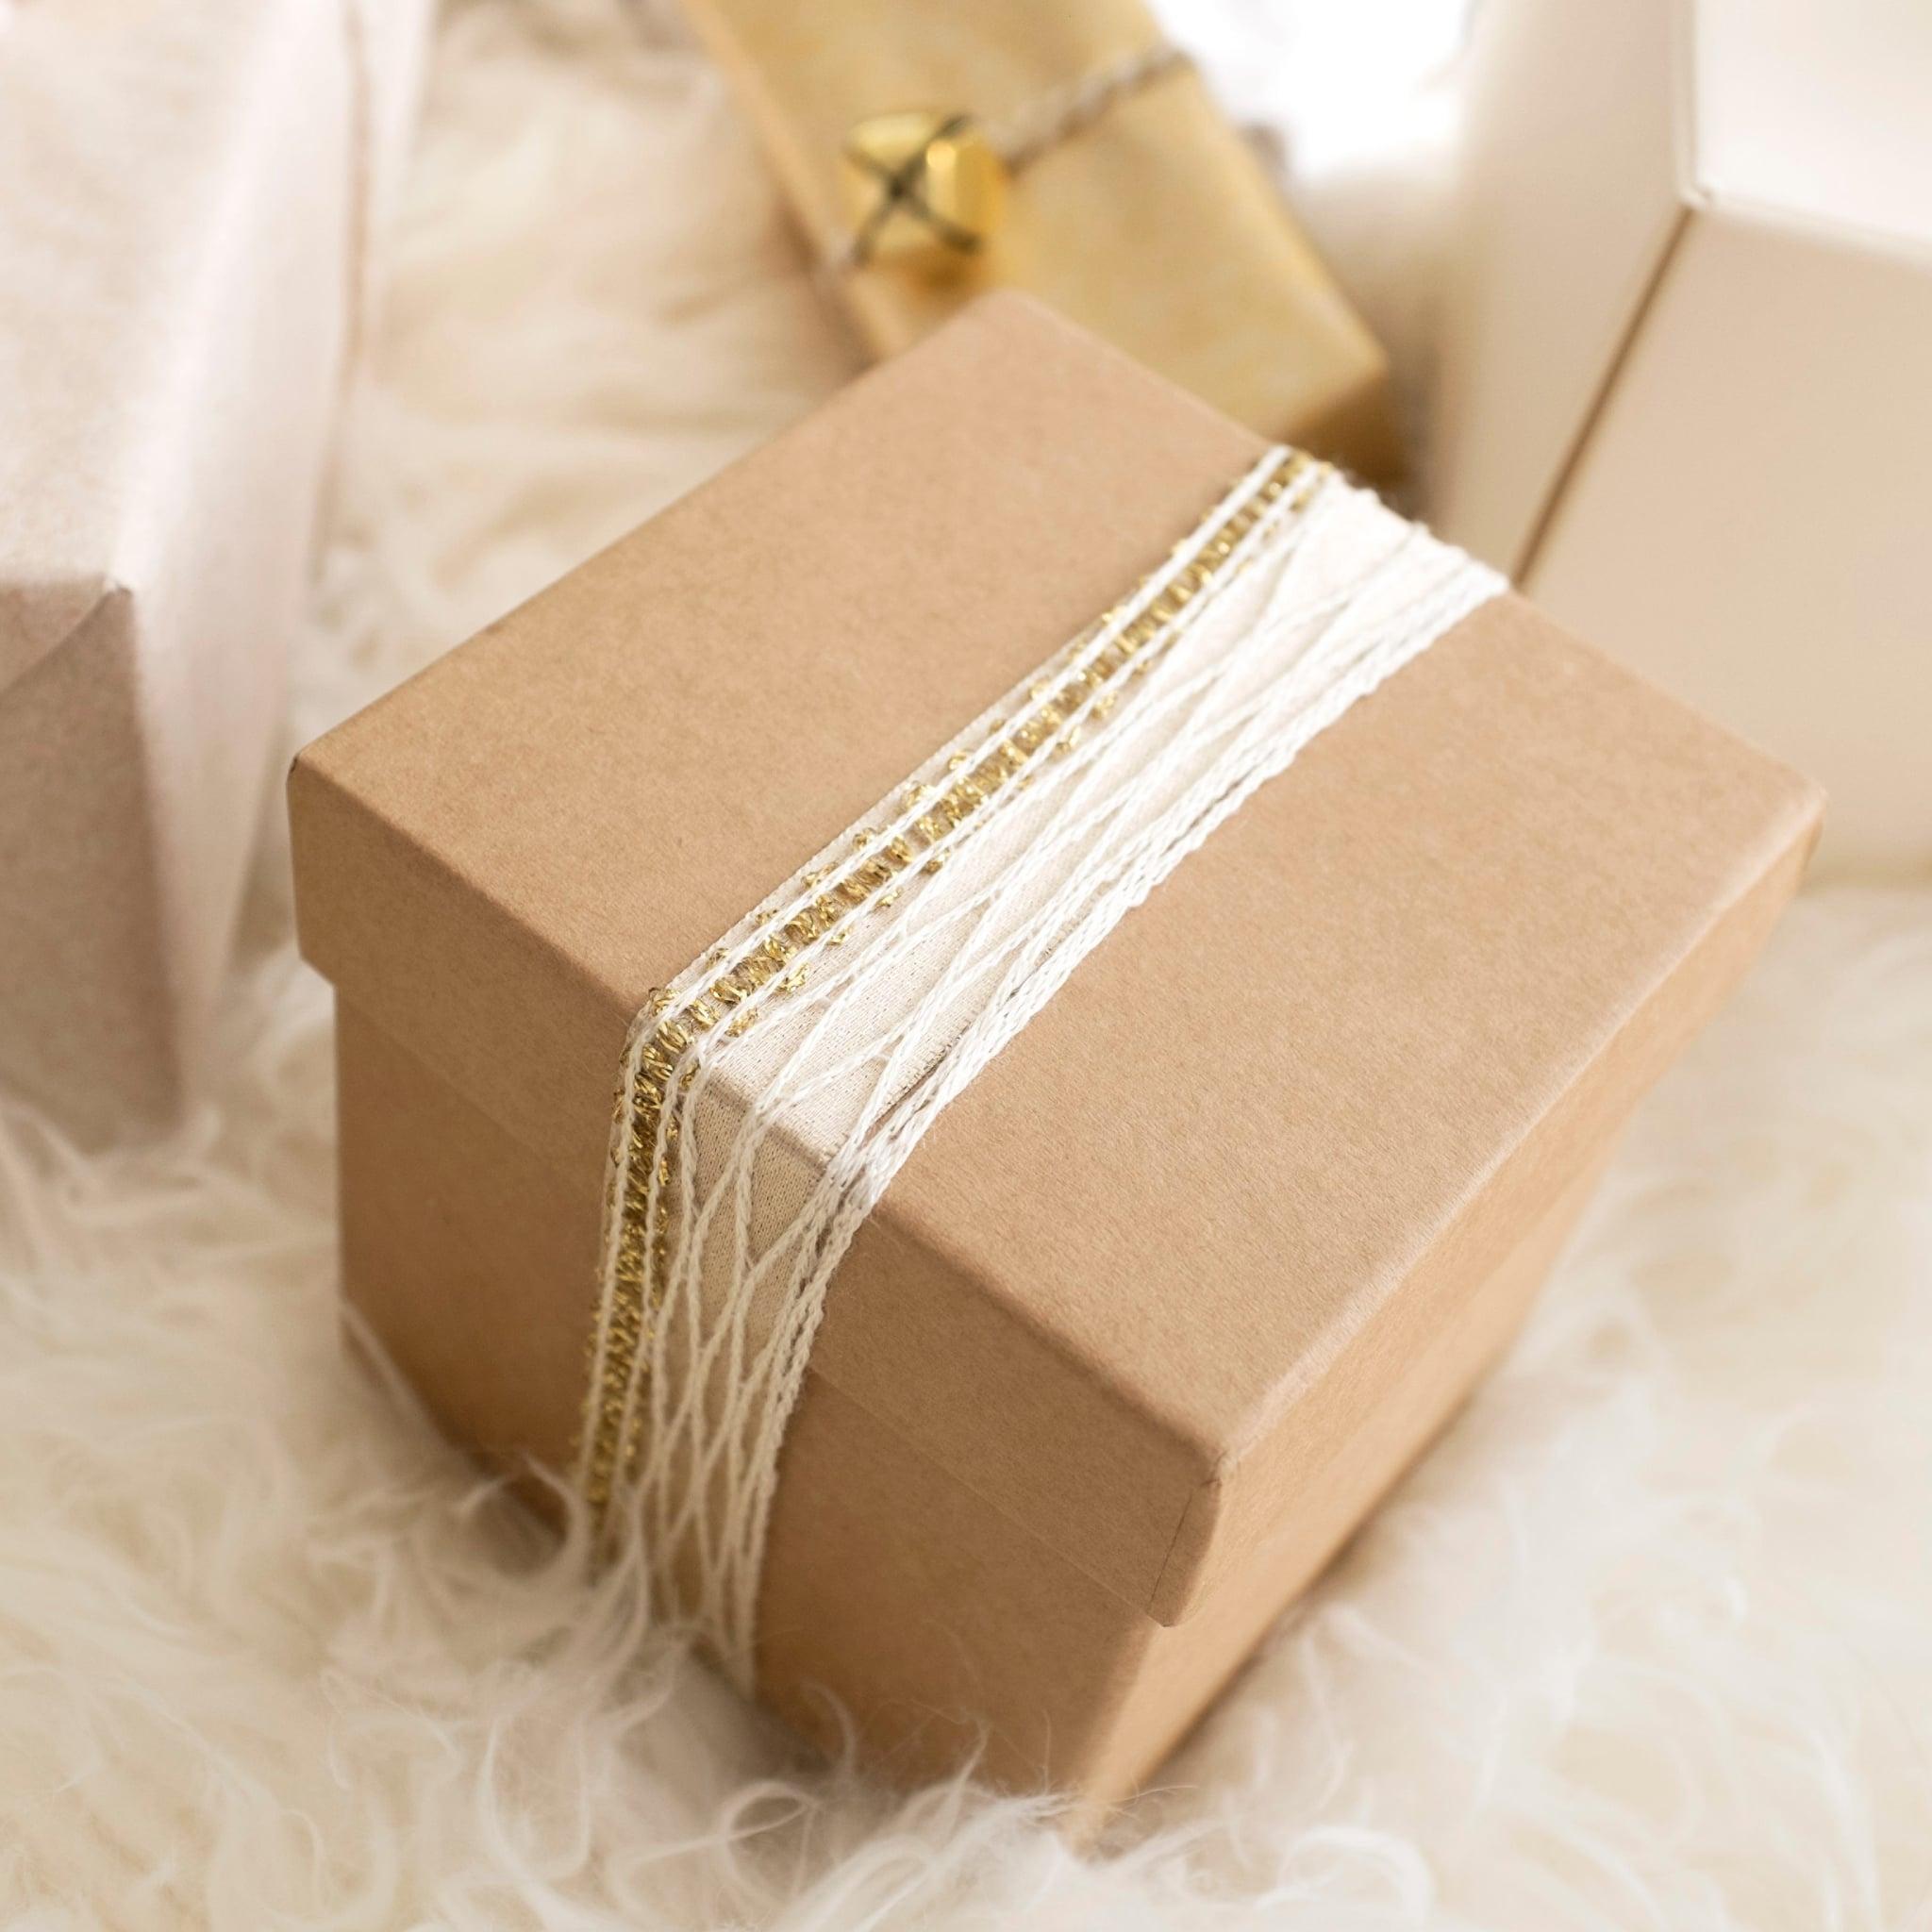 Themed Hanukkah Gifts For Kids | POPSUGAR Moms